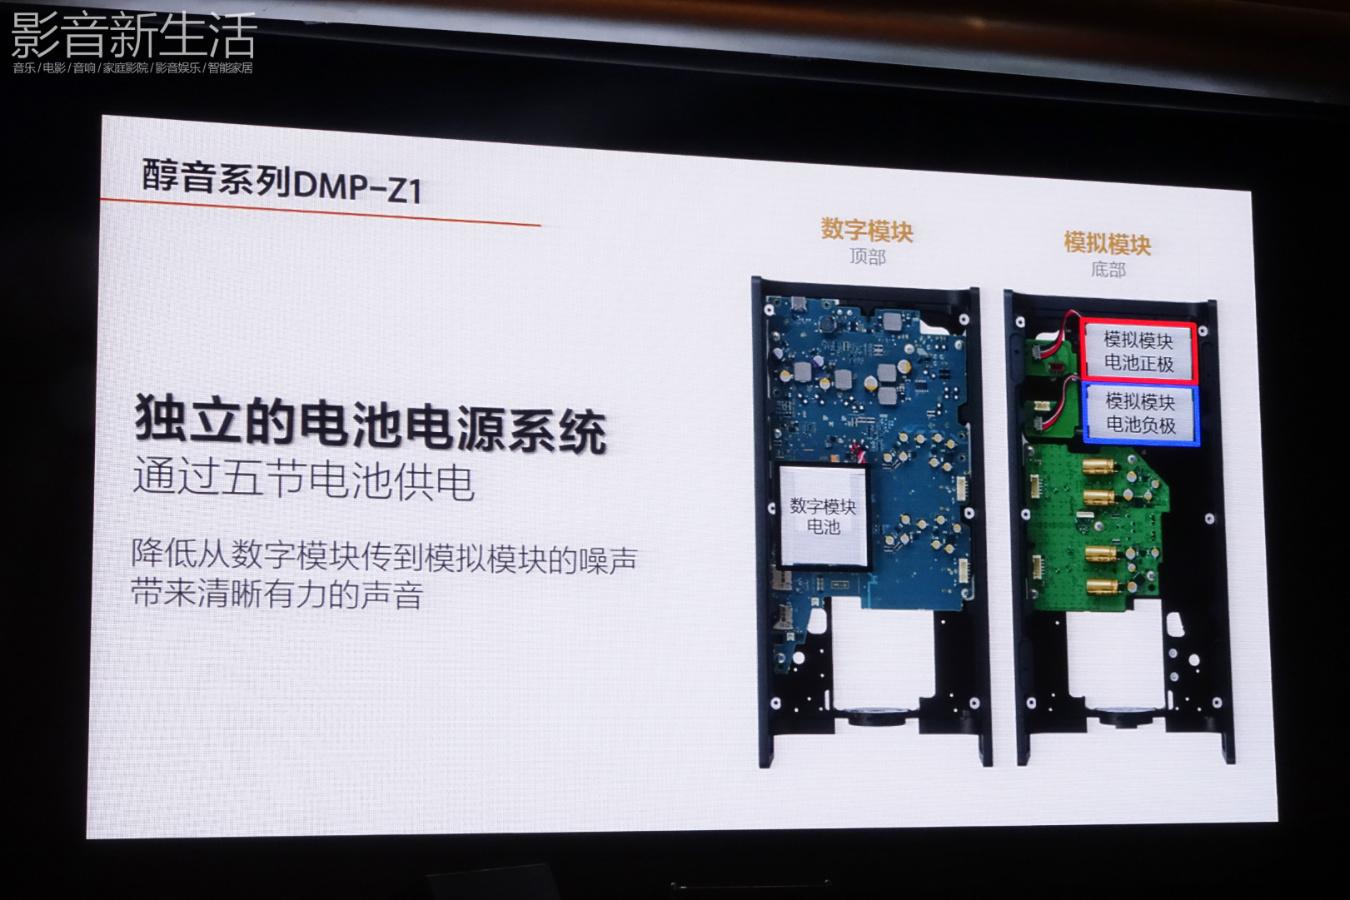 "Sony Hi Res 2018 55 - 新品 | ""重塑随身音乐娱乐王朝!"":Sony索尼发布Signature醇音系列新兄弟IER-Z1R和DMP-Z1,以及舞台监听耳机系列:IER-M7和IER-M9,还有升级款MDR-Z7M2!"